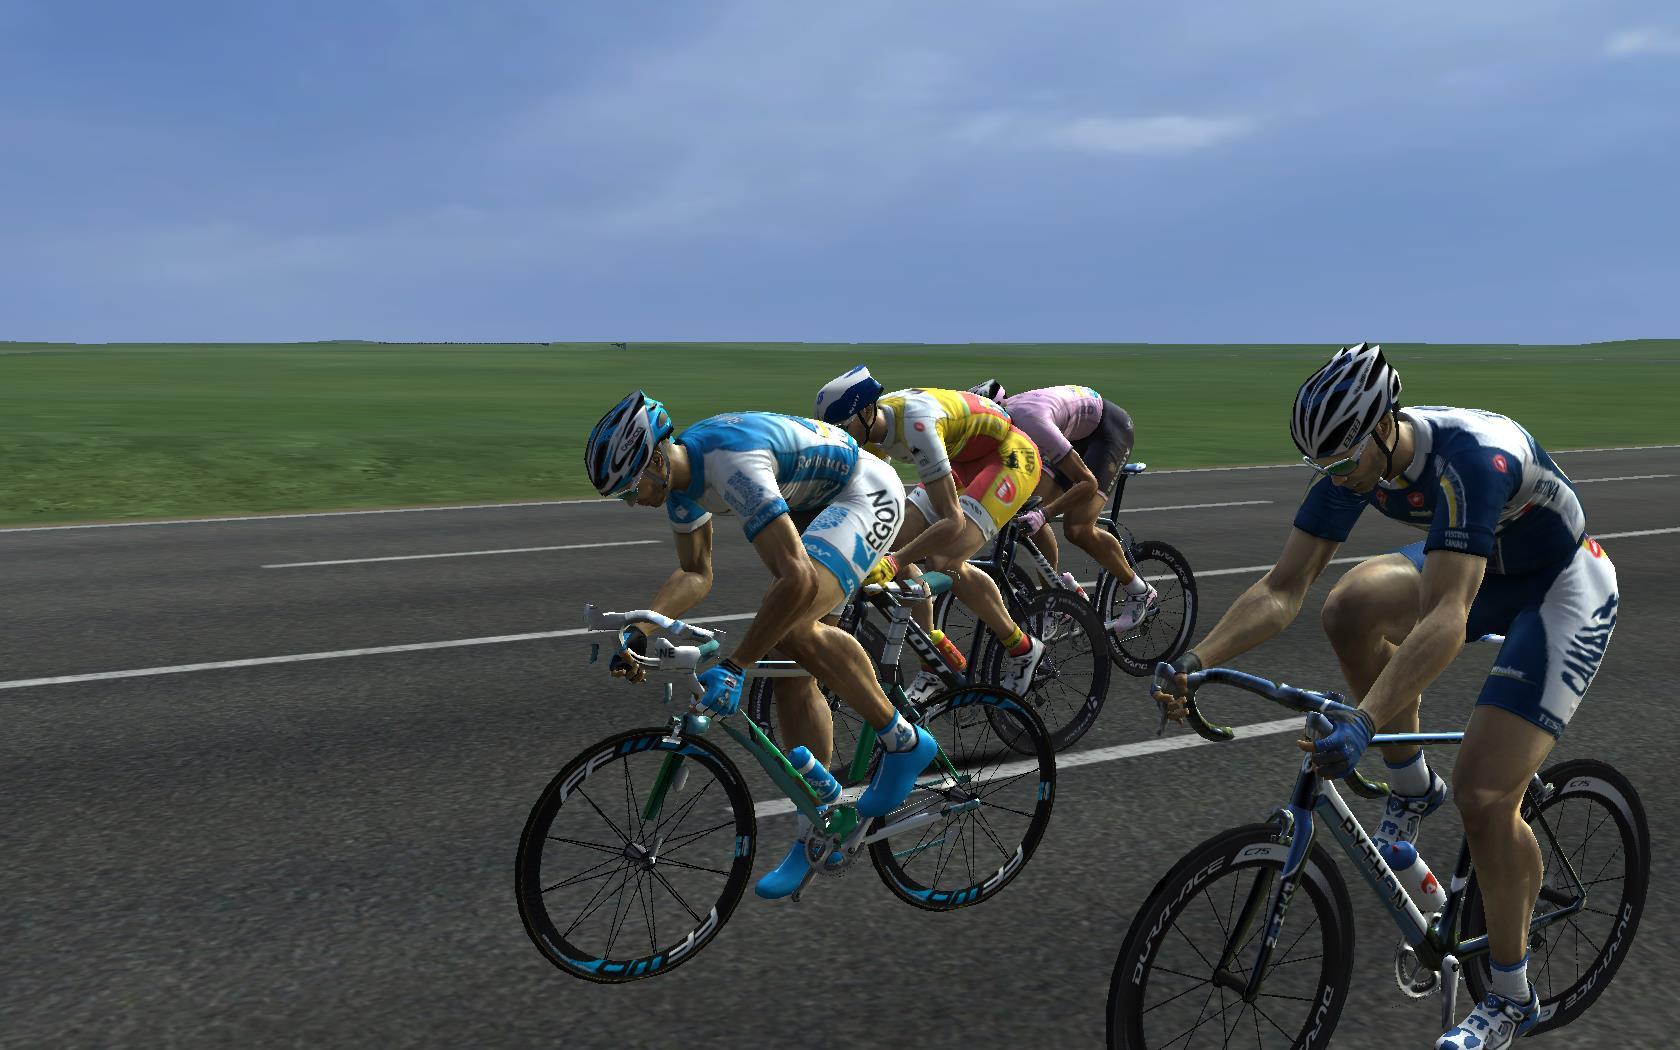 pcmdaily.com/images/mg/2018/Races/C2/USAPCC/1/PCM0014.jpg